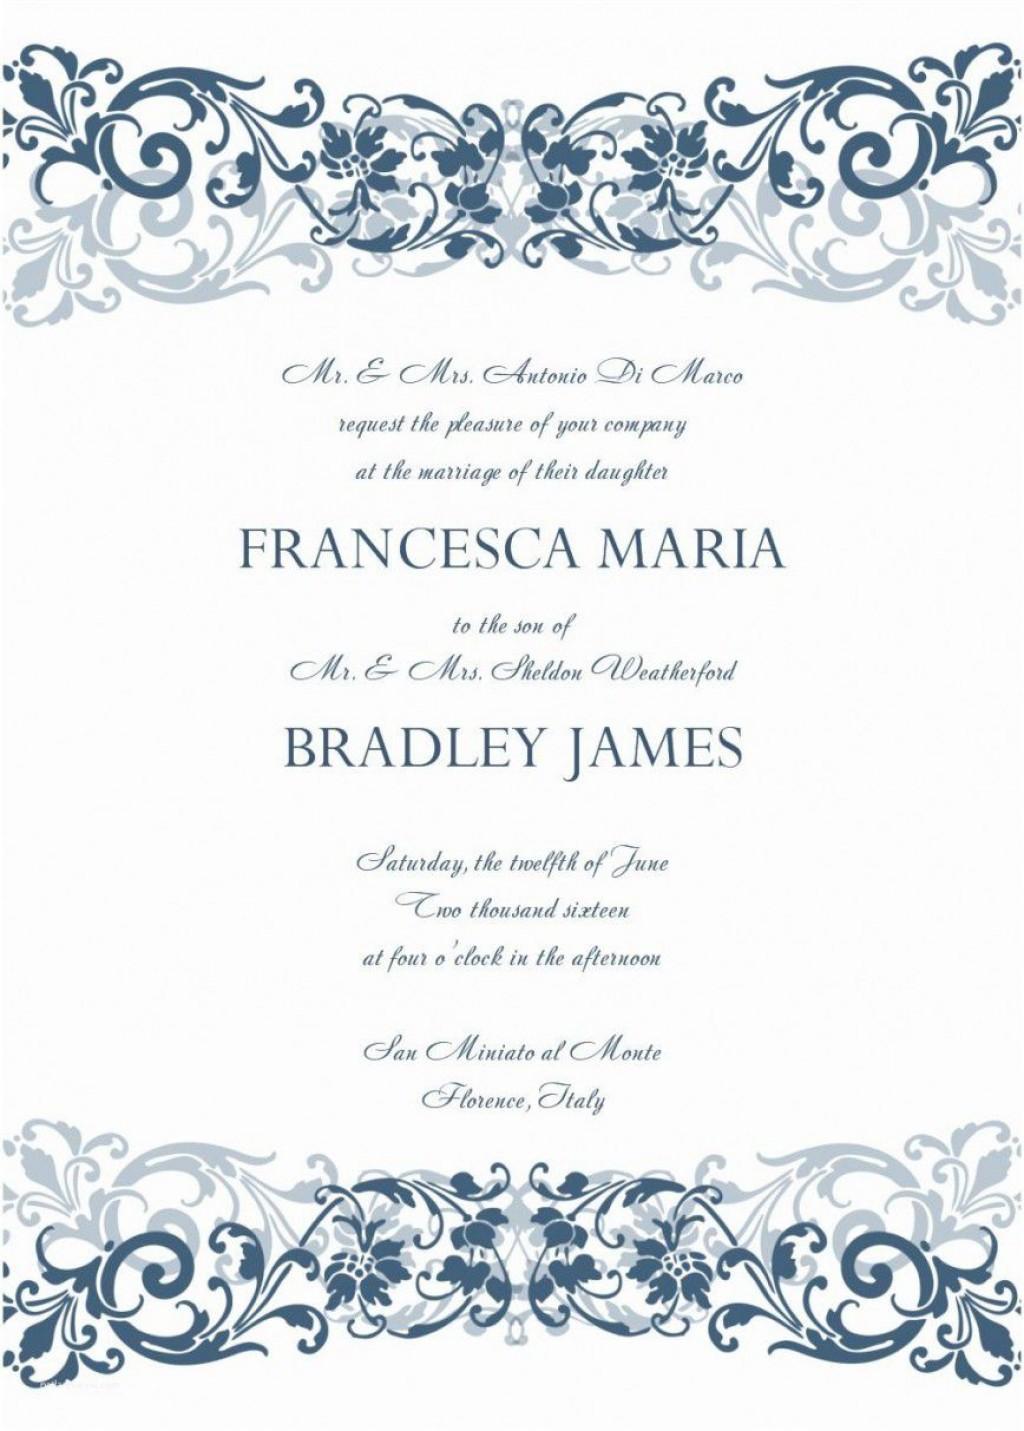 001 Phenomenal M Word Invitation Template Photo  Microsoft Card Wedding Free Download EditableLarge